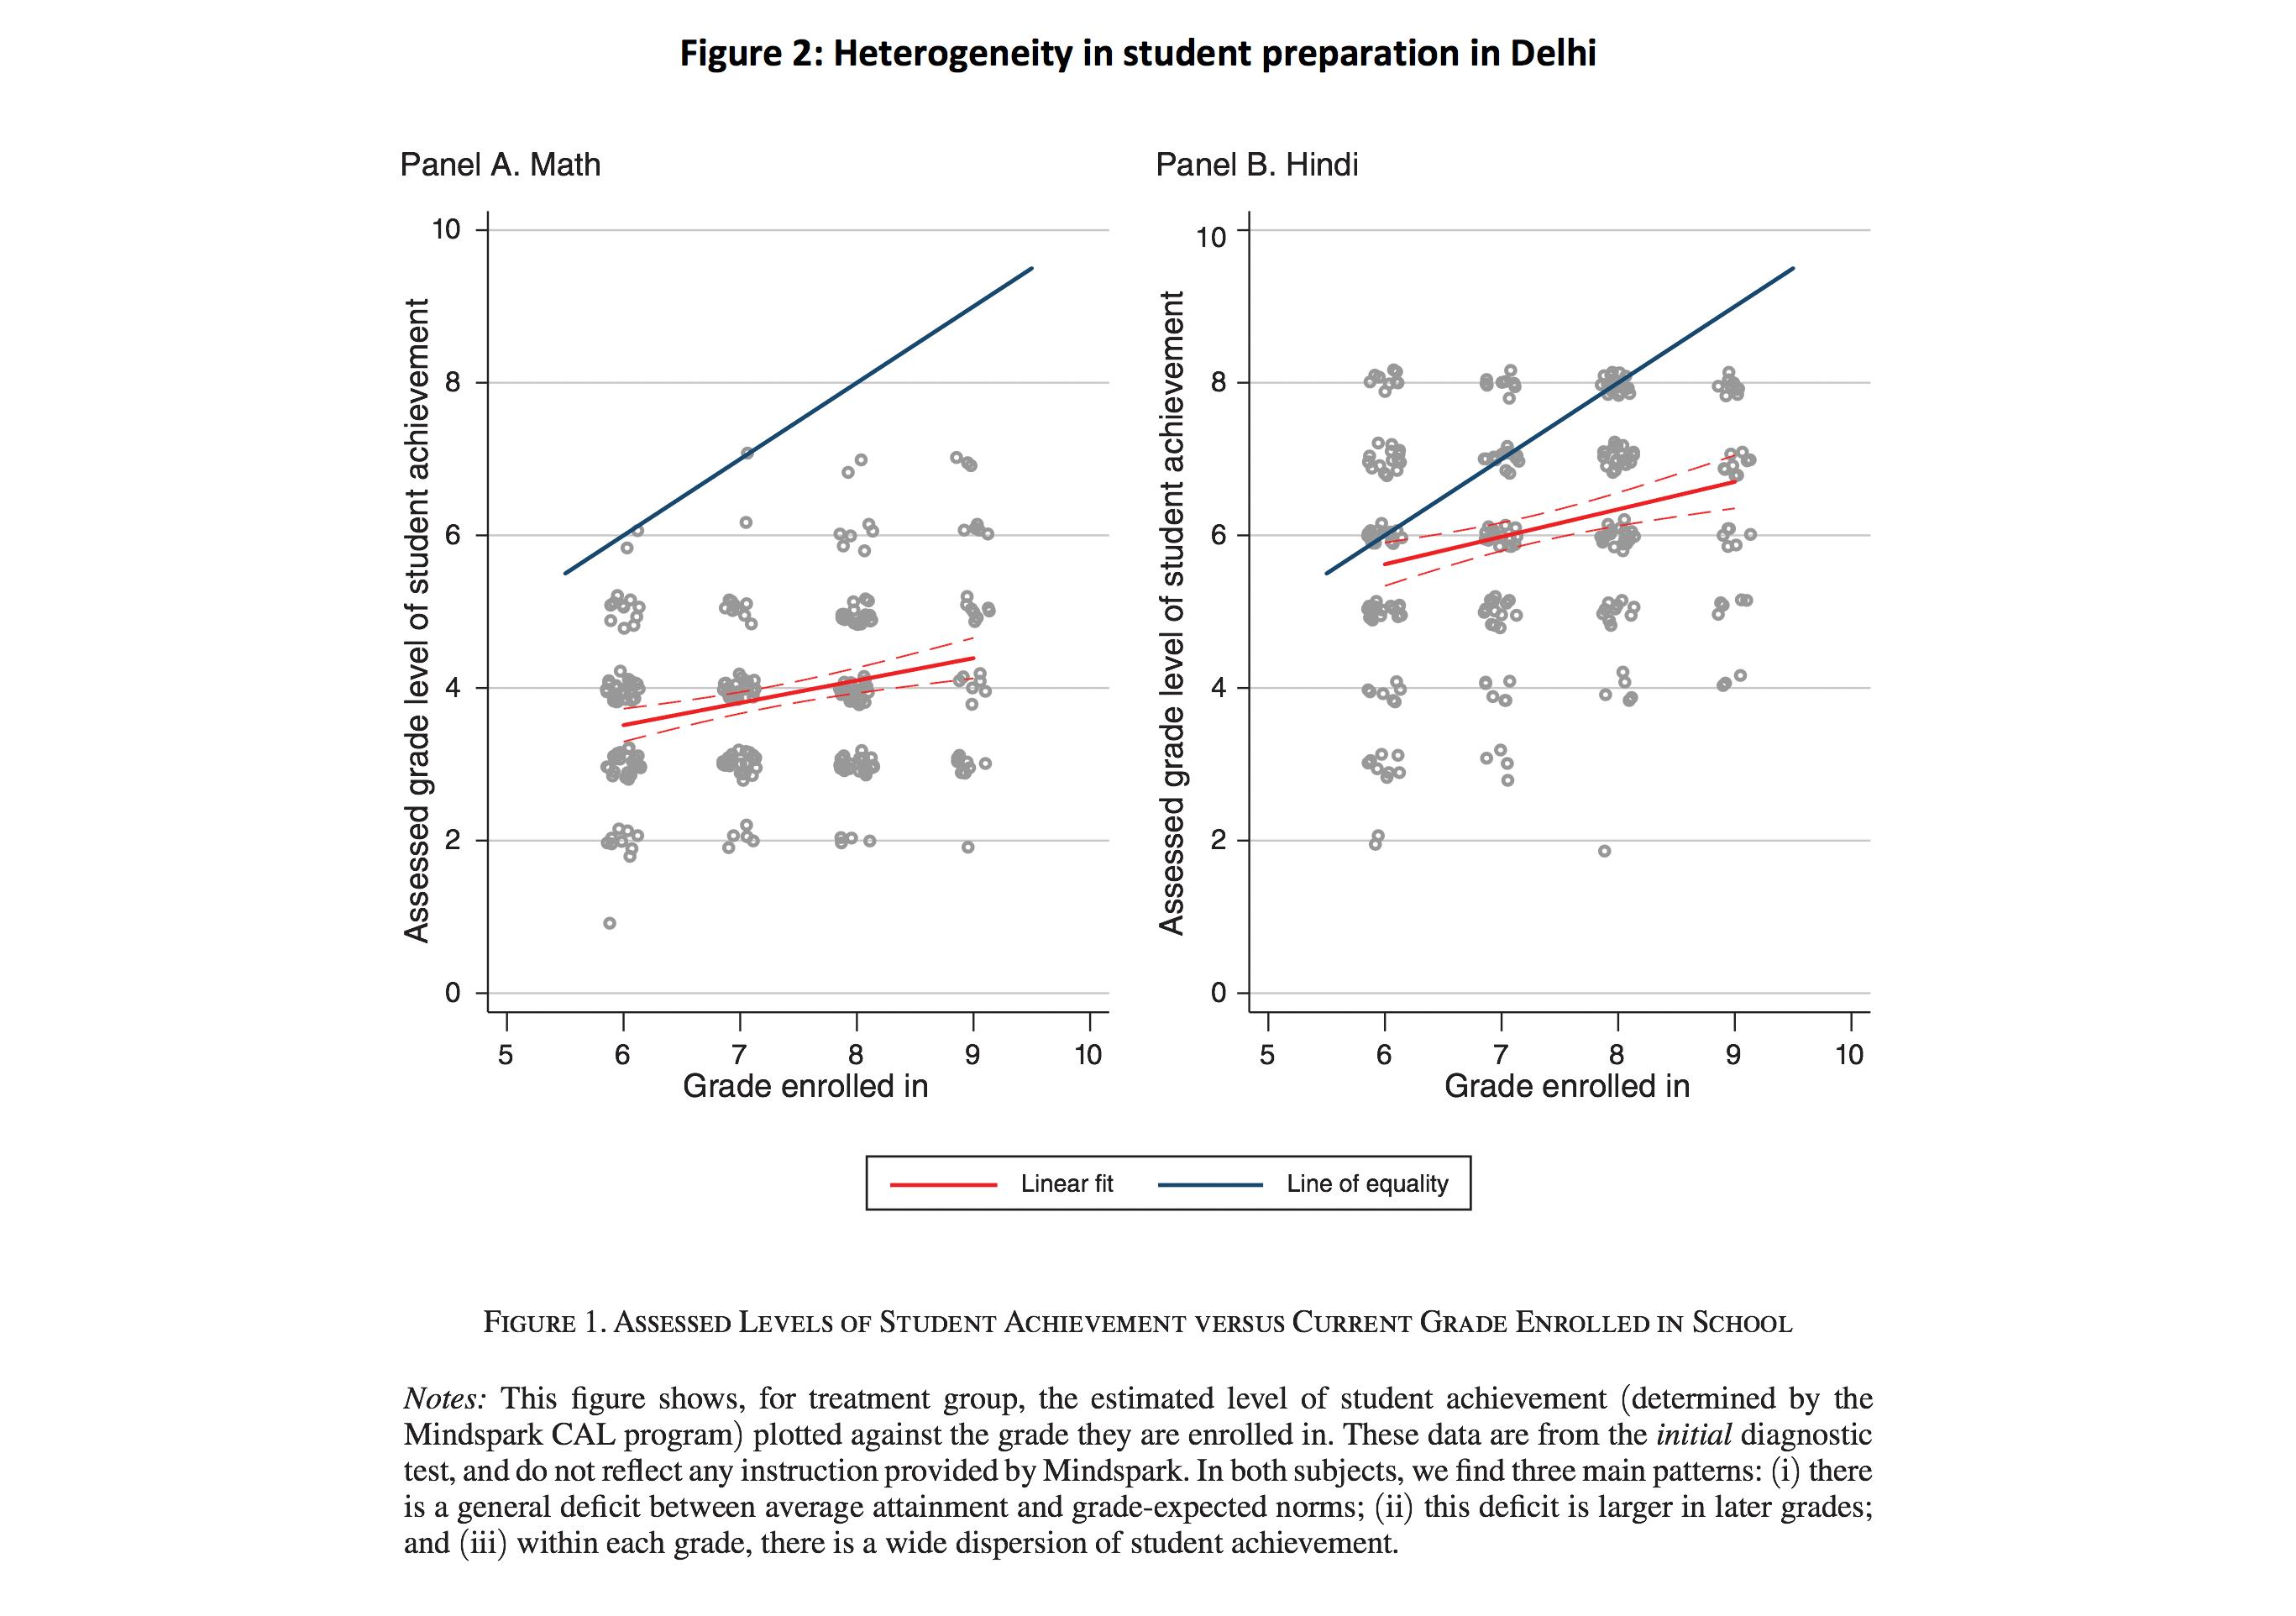 Figure 2: Heterogeneity in student preparation in Delhi